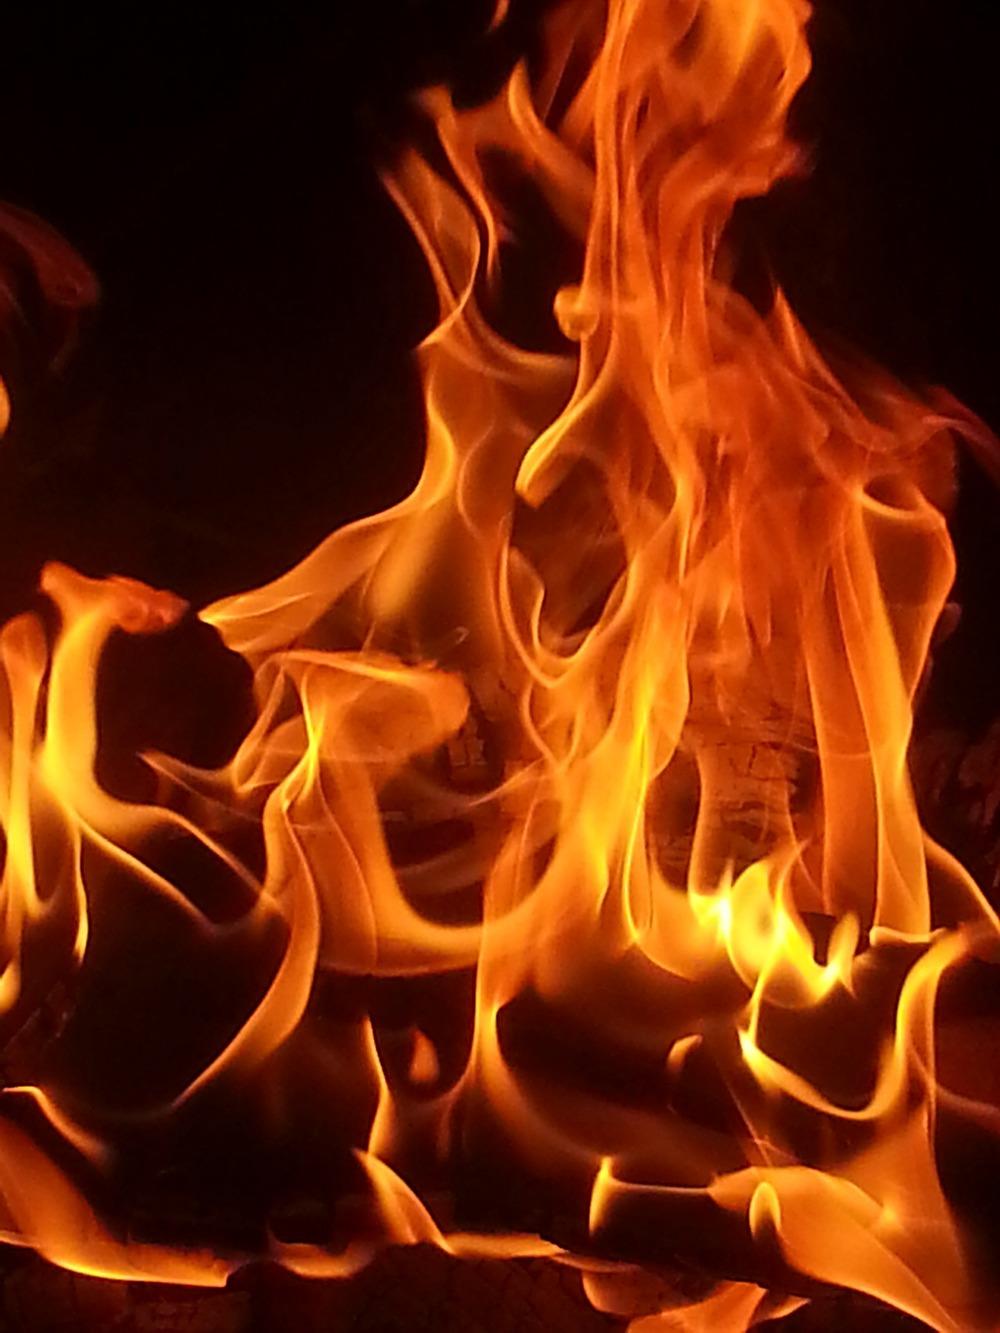 fire_burn_flames.jpg